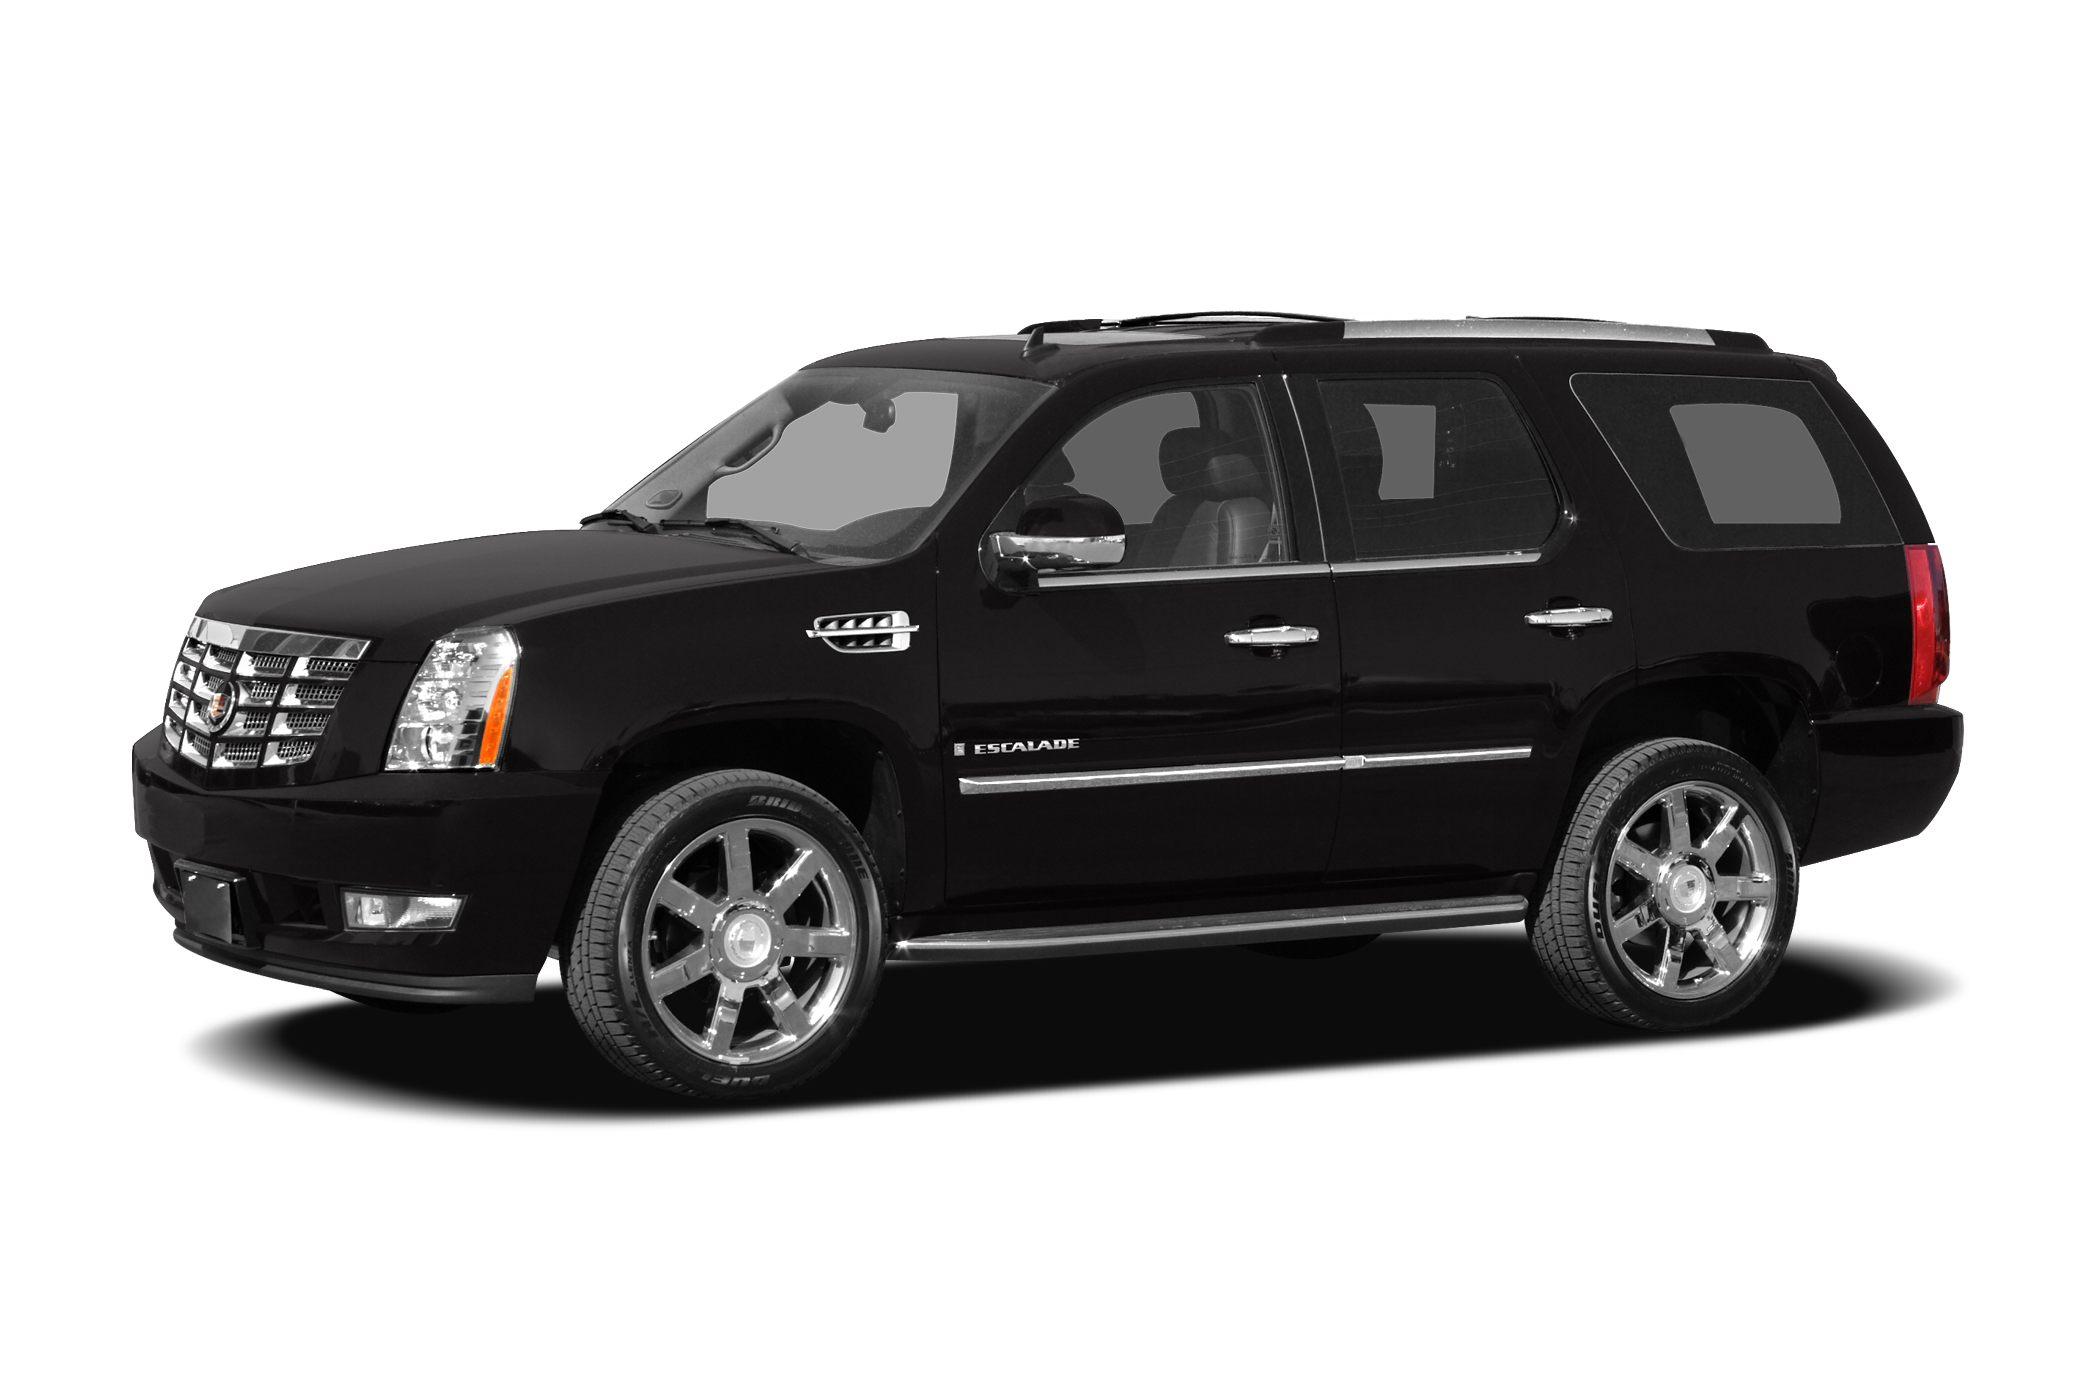 2008 Cadillac Escalade Information